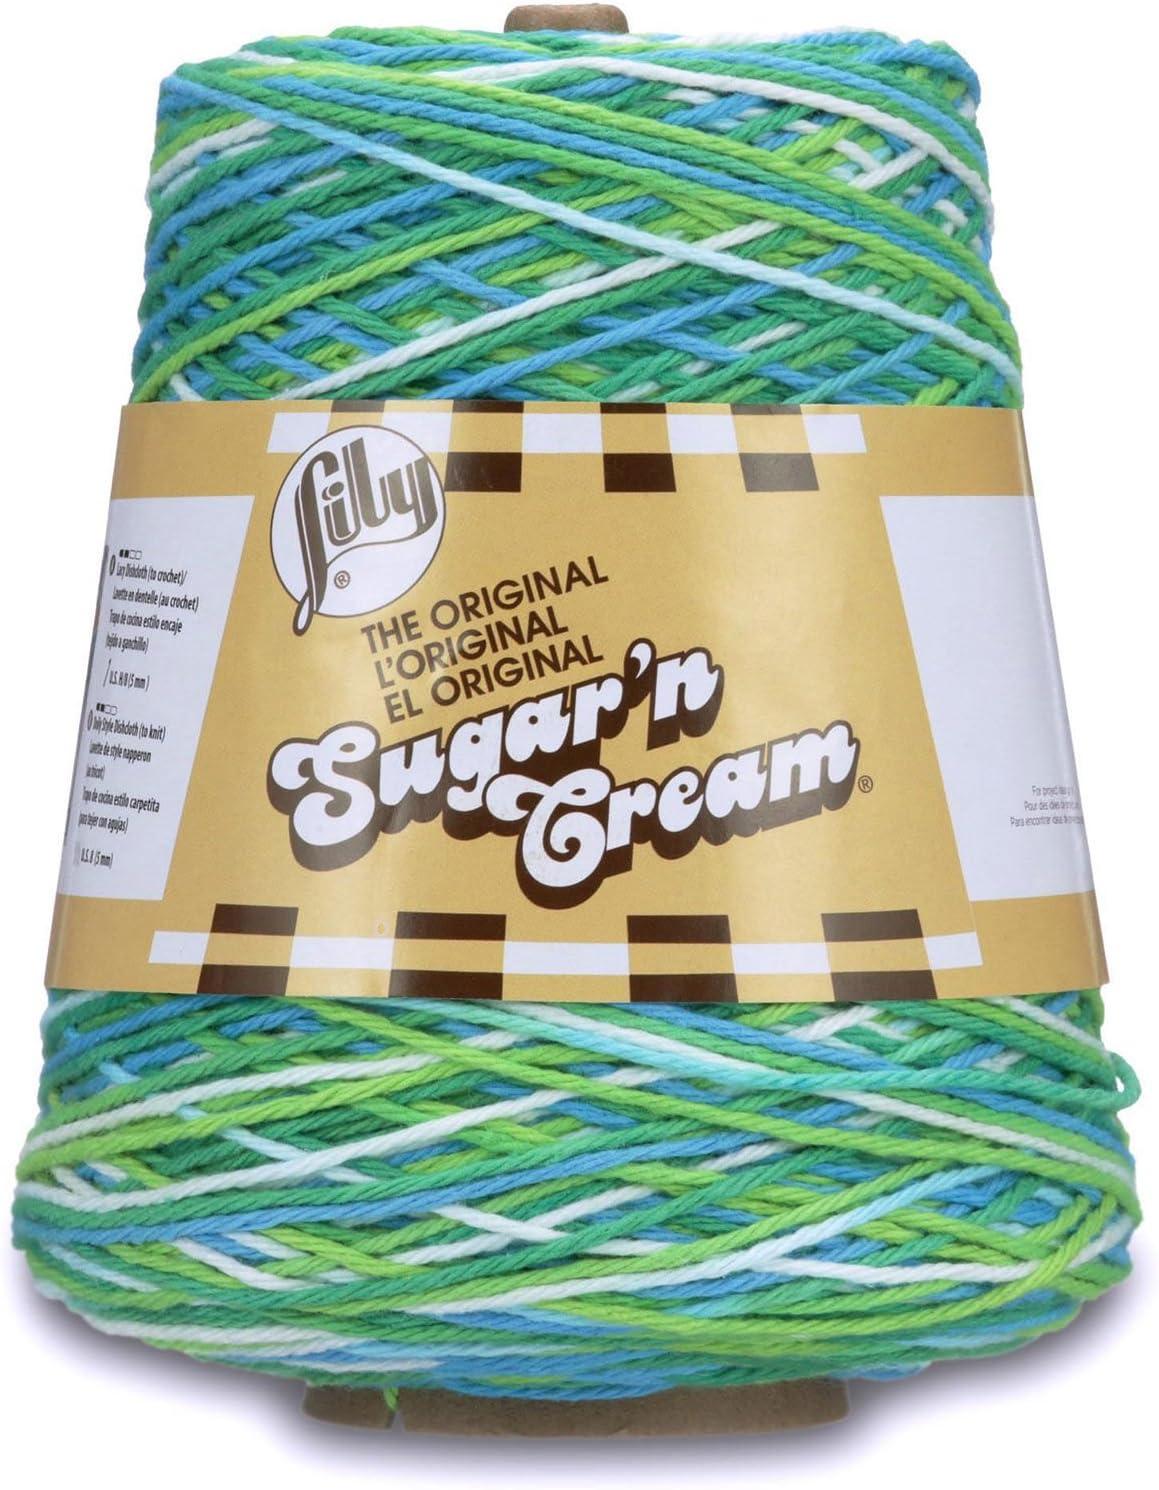 Lily Sugar'n Cream Cotton Cone Yarn, 14 oz, Potpourri , 1 Cone